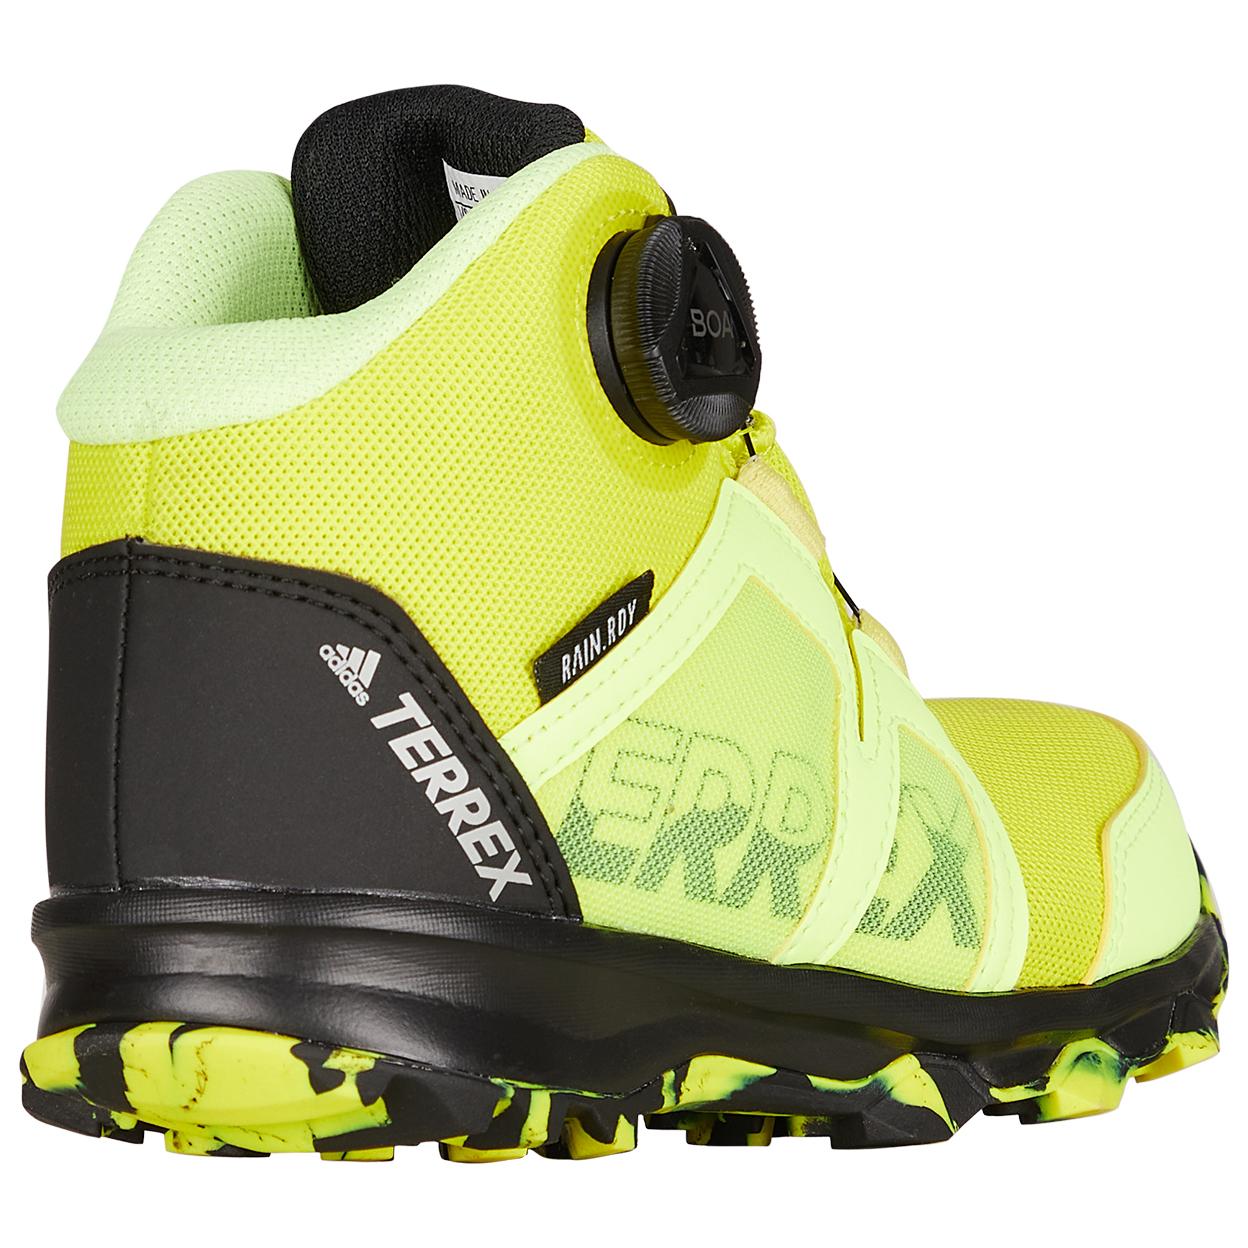 Pobreza extrema alegría Semejanza  Adidas Terrex BOA Mid Rain Ready - Walking boots Kids   Free EU Delivery    Bergfreunde.eu